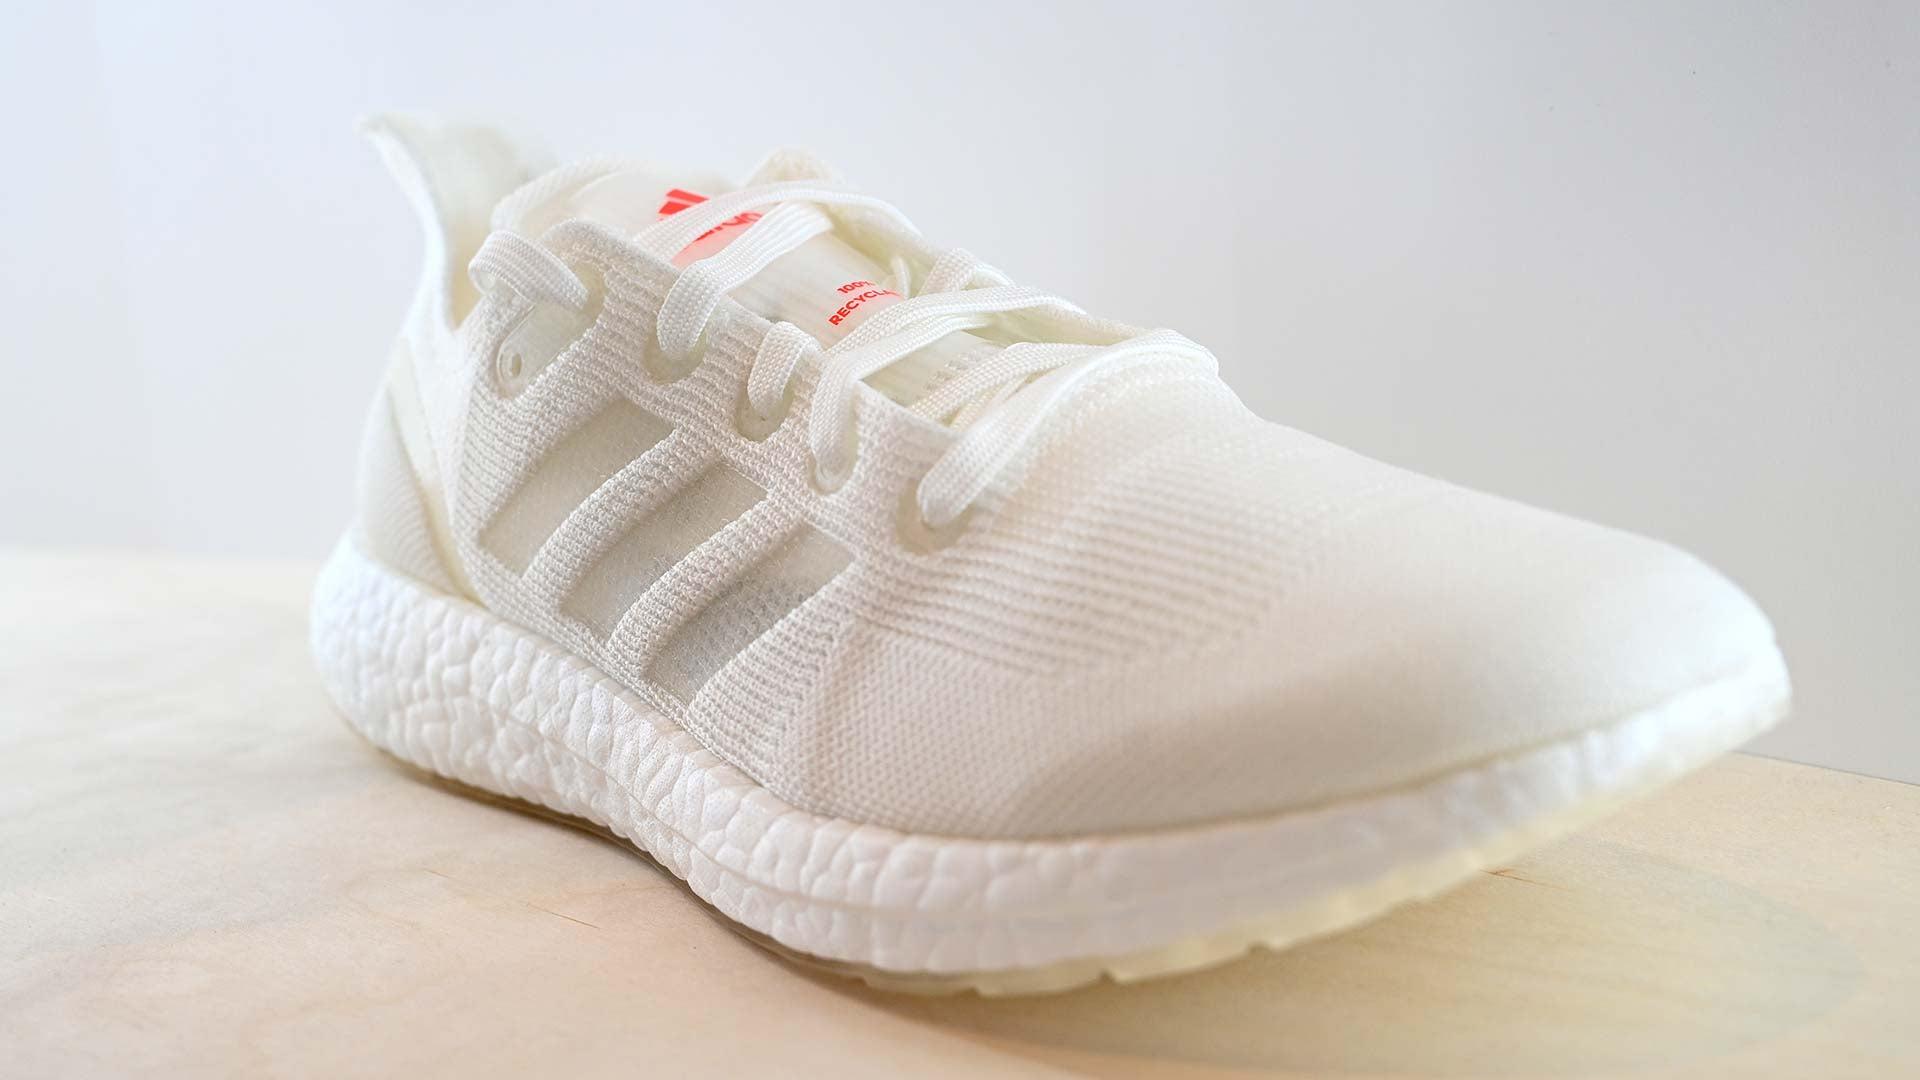 Adidas' FutureCraft Loop Sneaker Talks A Big Recycling Game